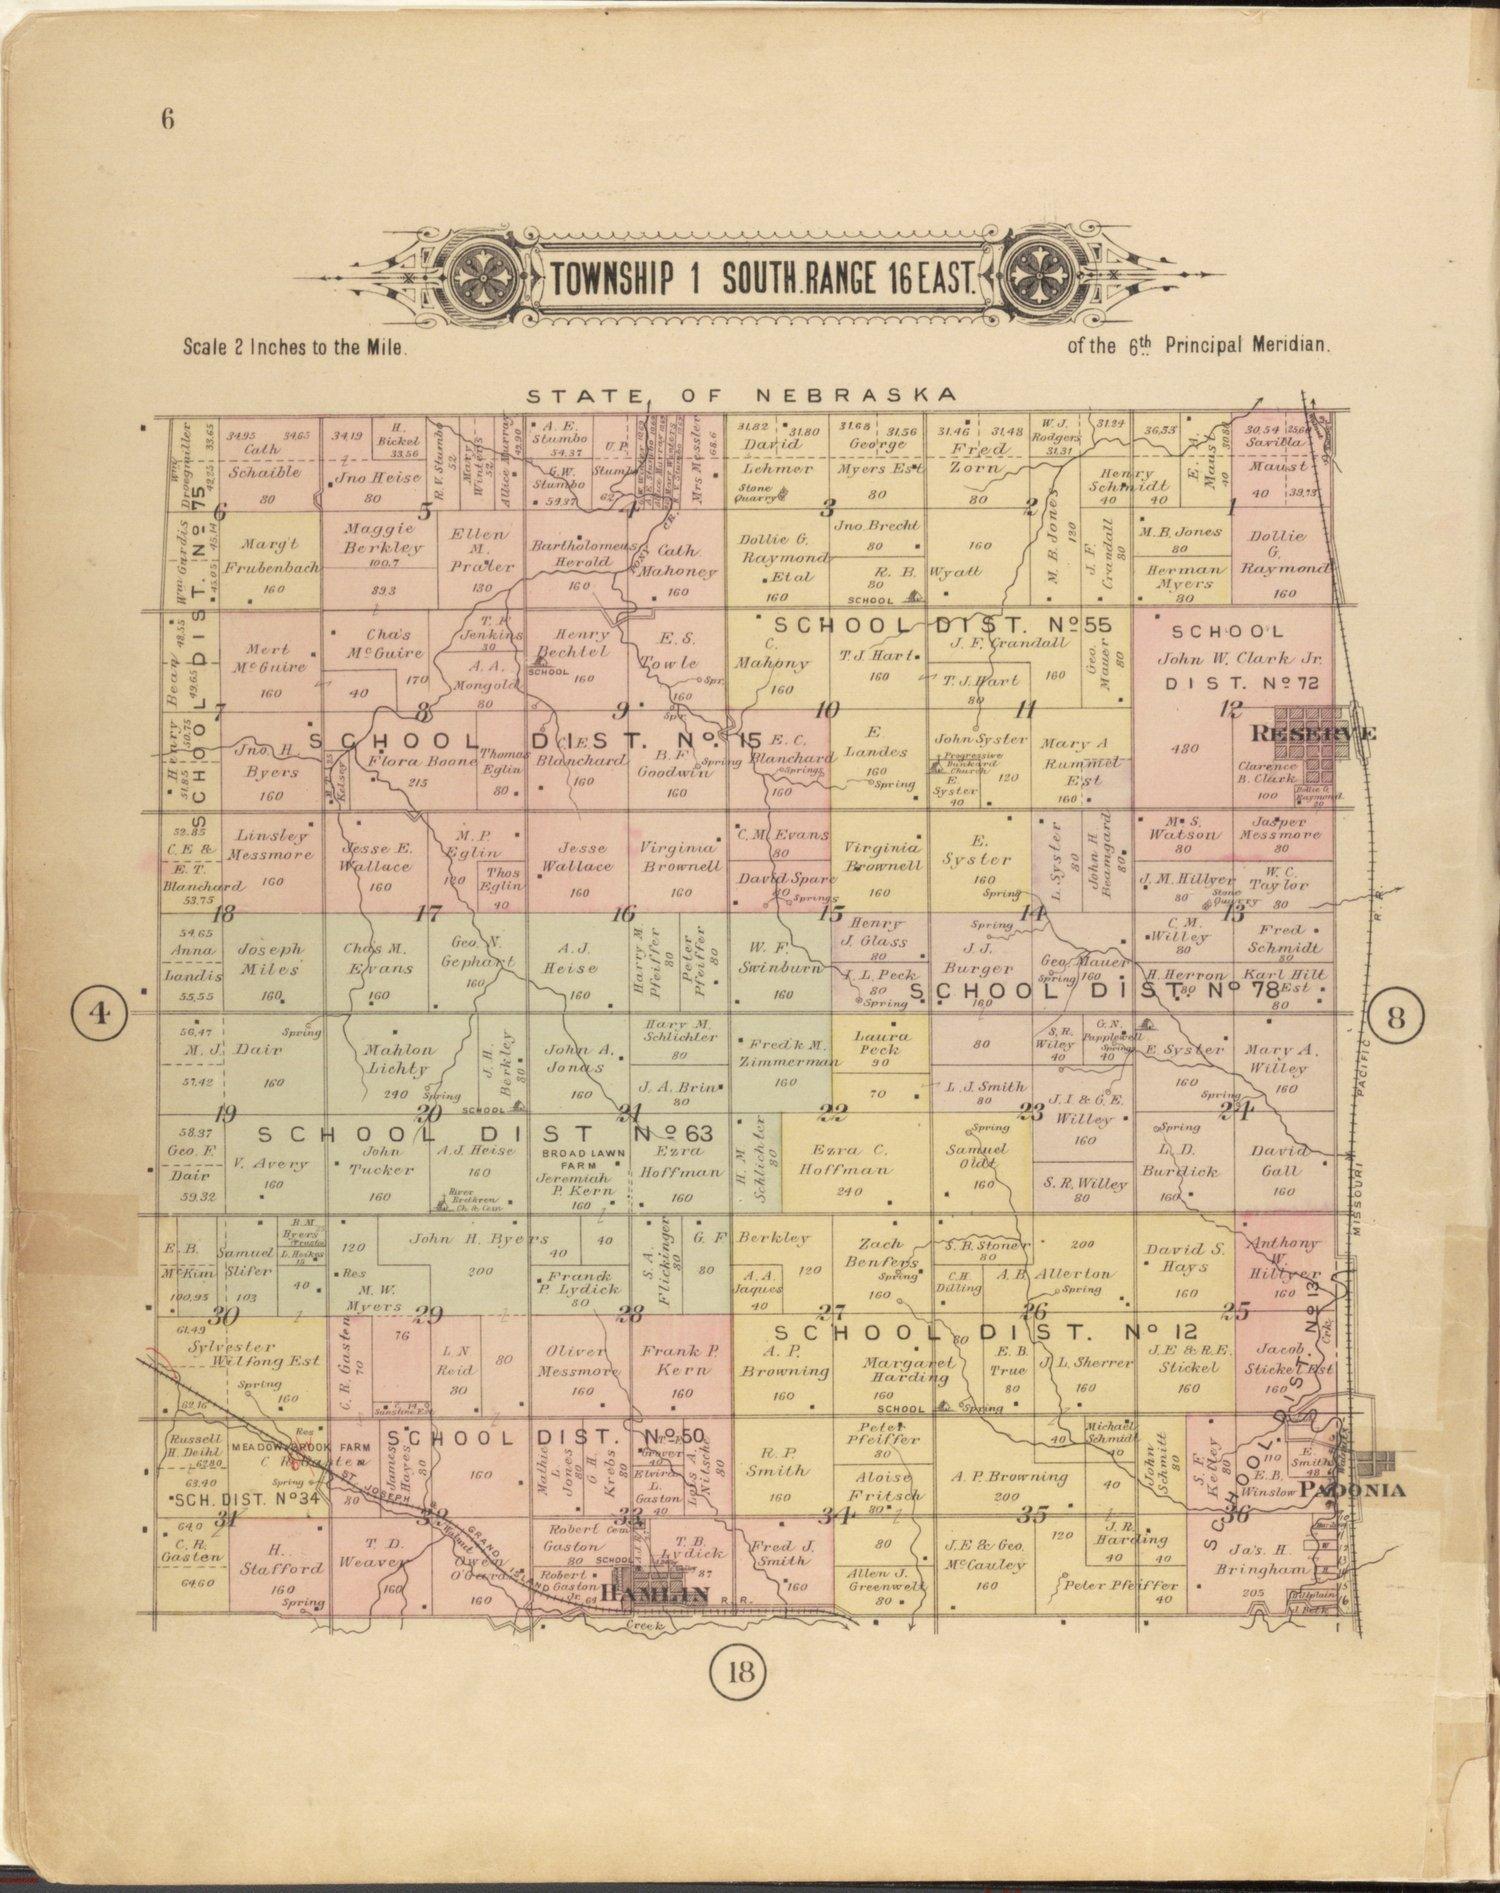 Plat book of Brown County, Kansas - 6